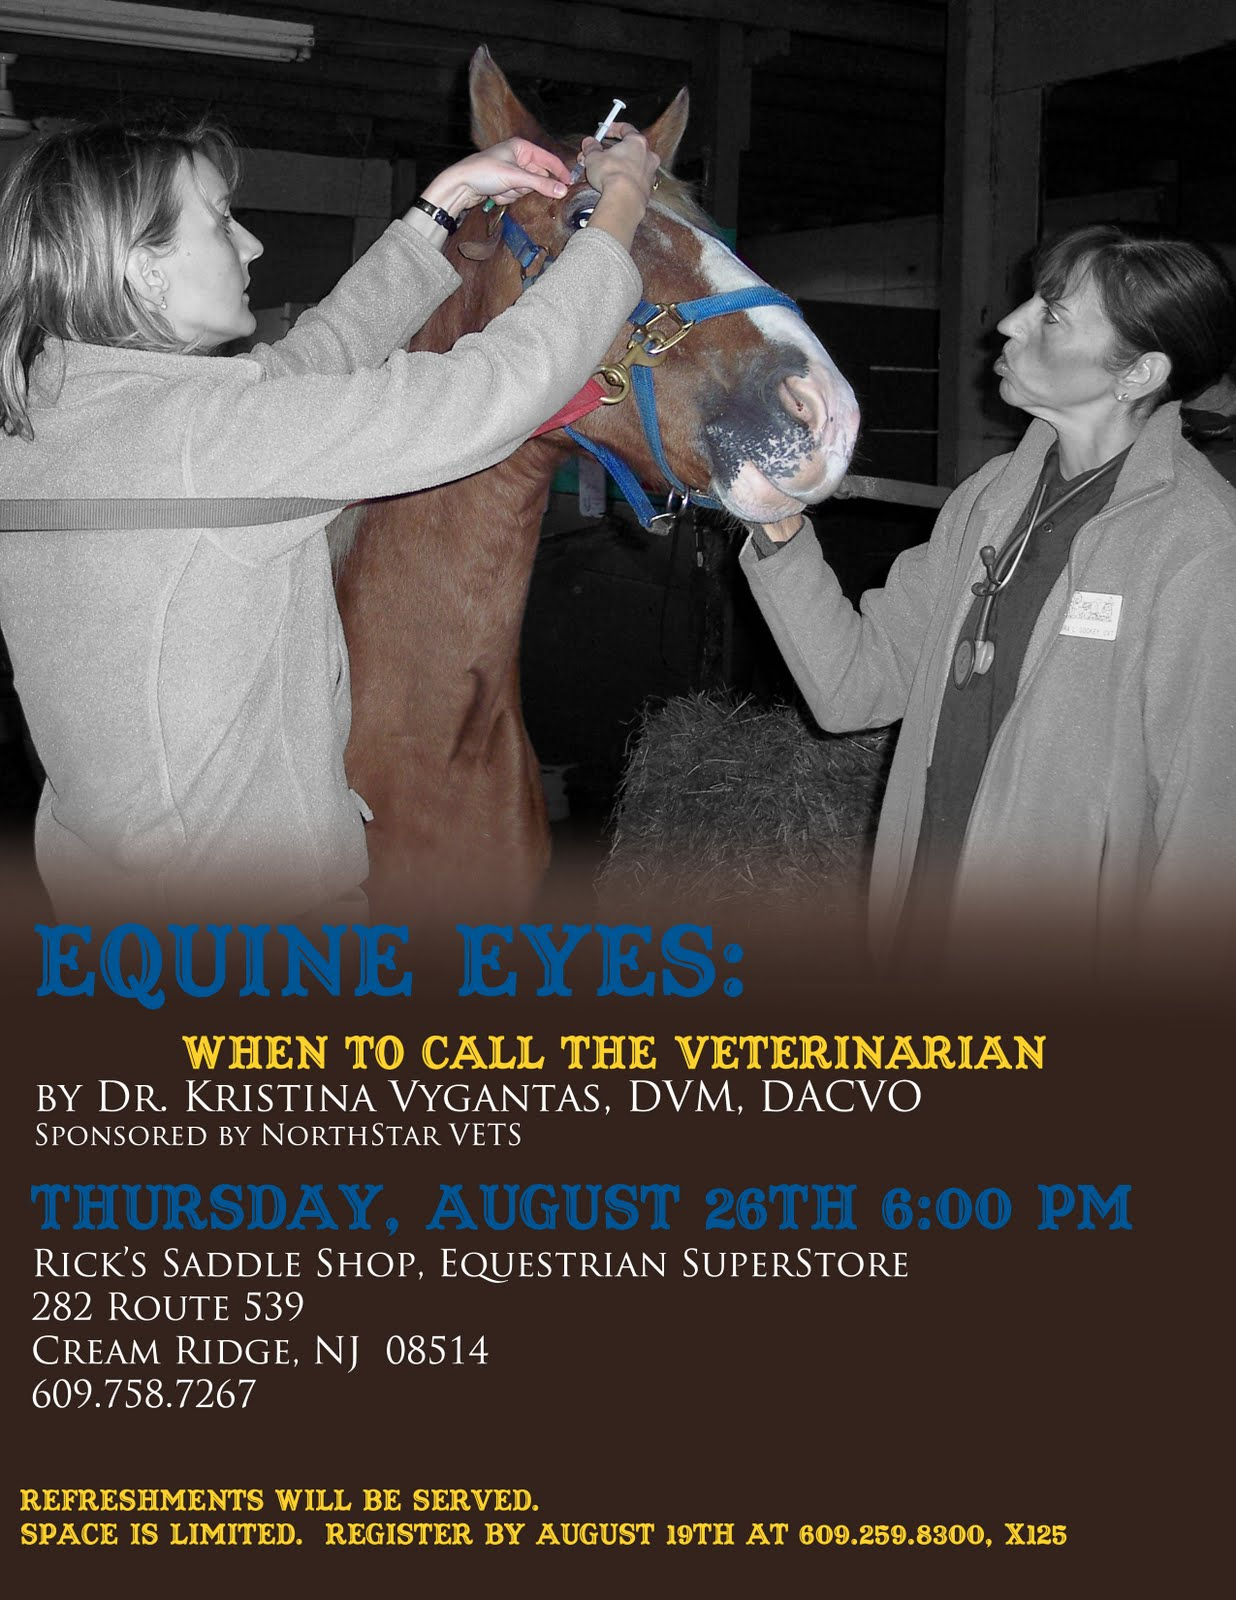 http://3.bp.blogspot.com/_PX5JYNC5j-c/TEC9CpcKajI/AAAAAAAAAHU/IFWCbNOT24g/s1600/Rick%27s+Saddle+Shop+Lecture.jpg